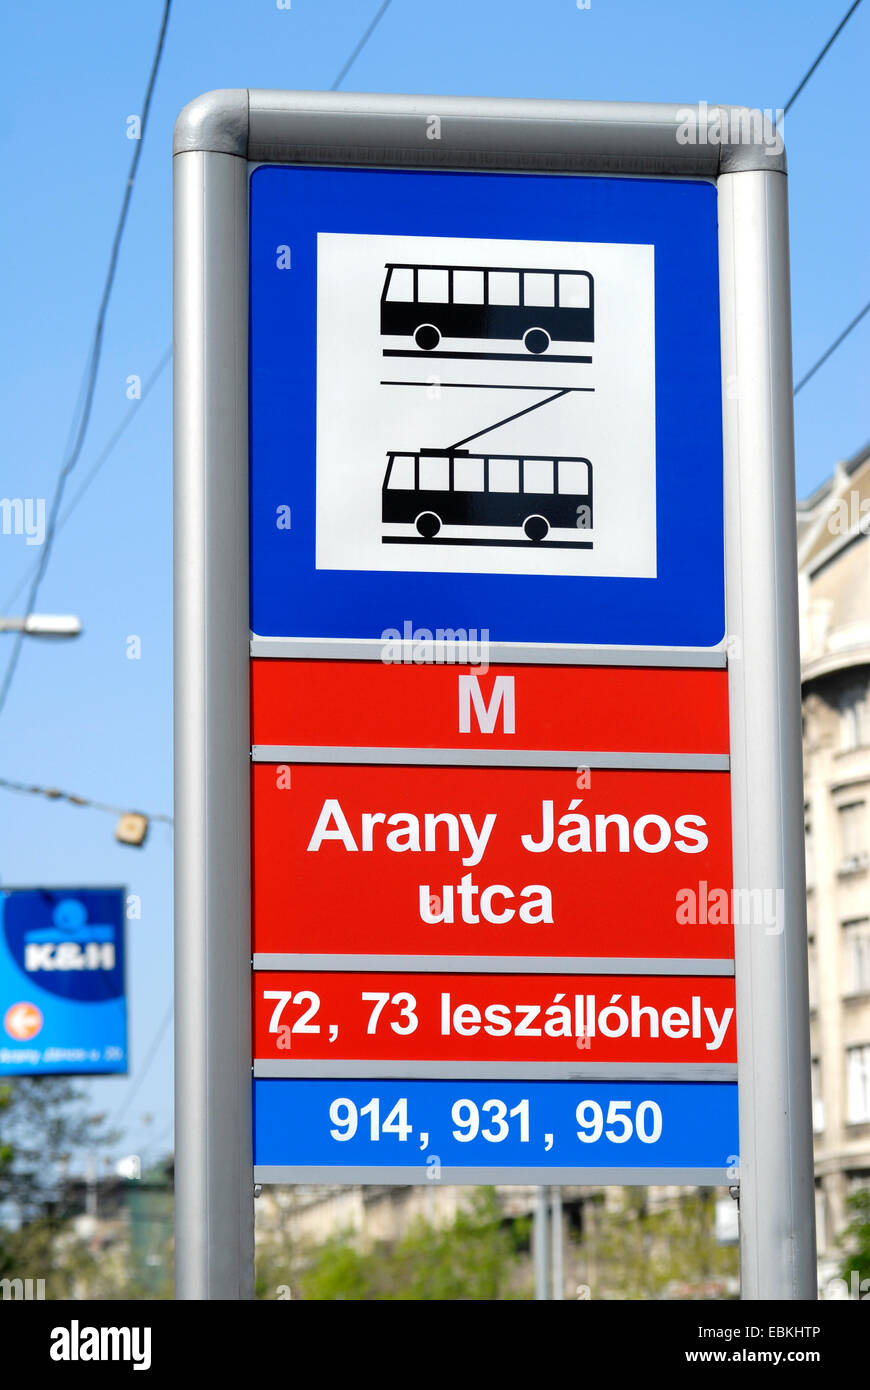 Budapest, Hungary. Bus and Trolleybus stop sign in Arany Janos utca (street) Stock Photo